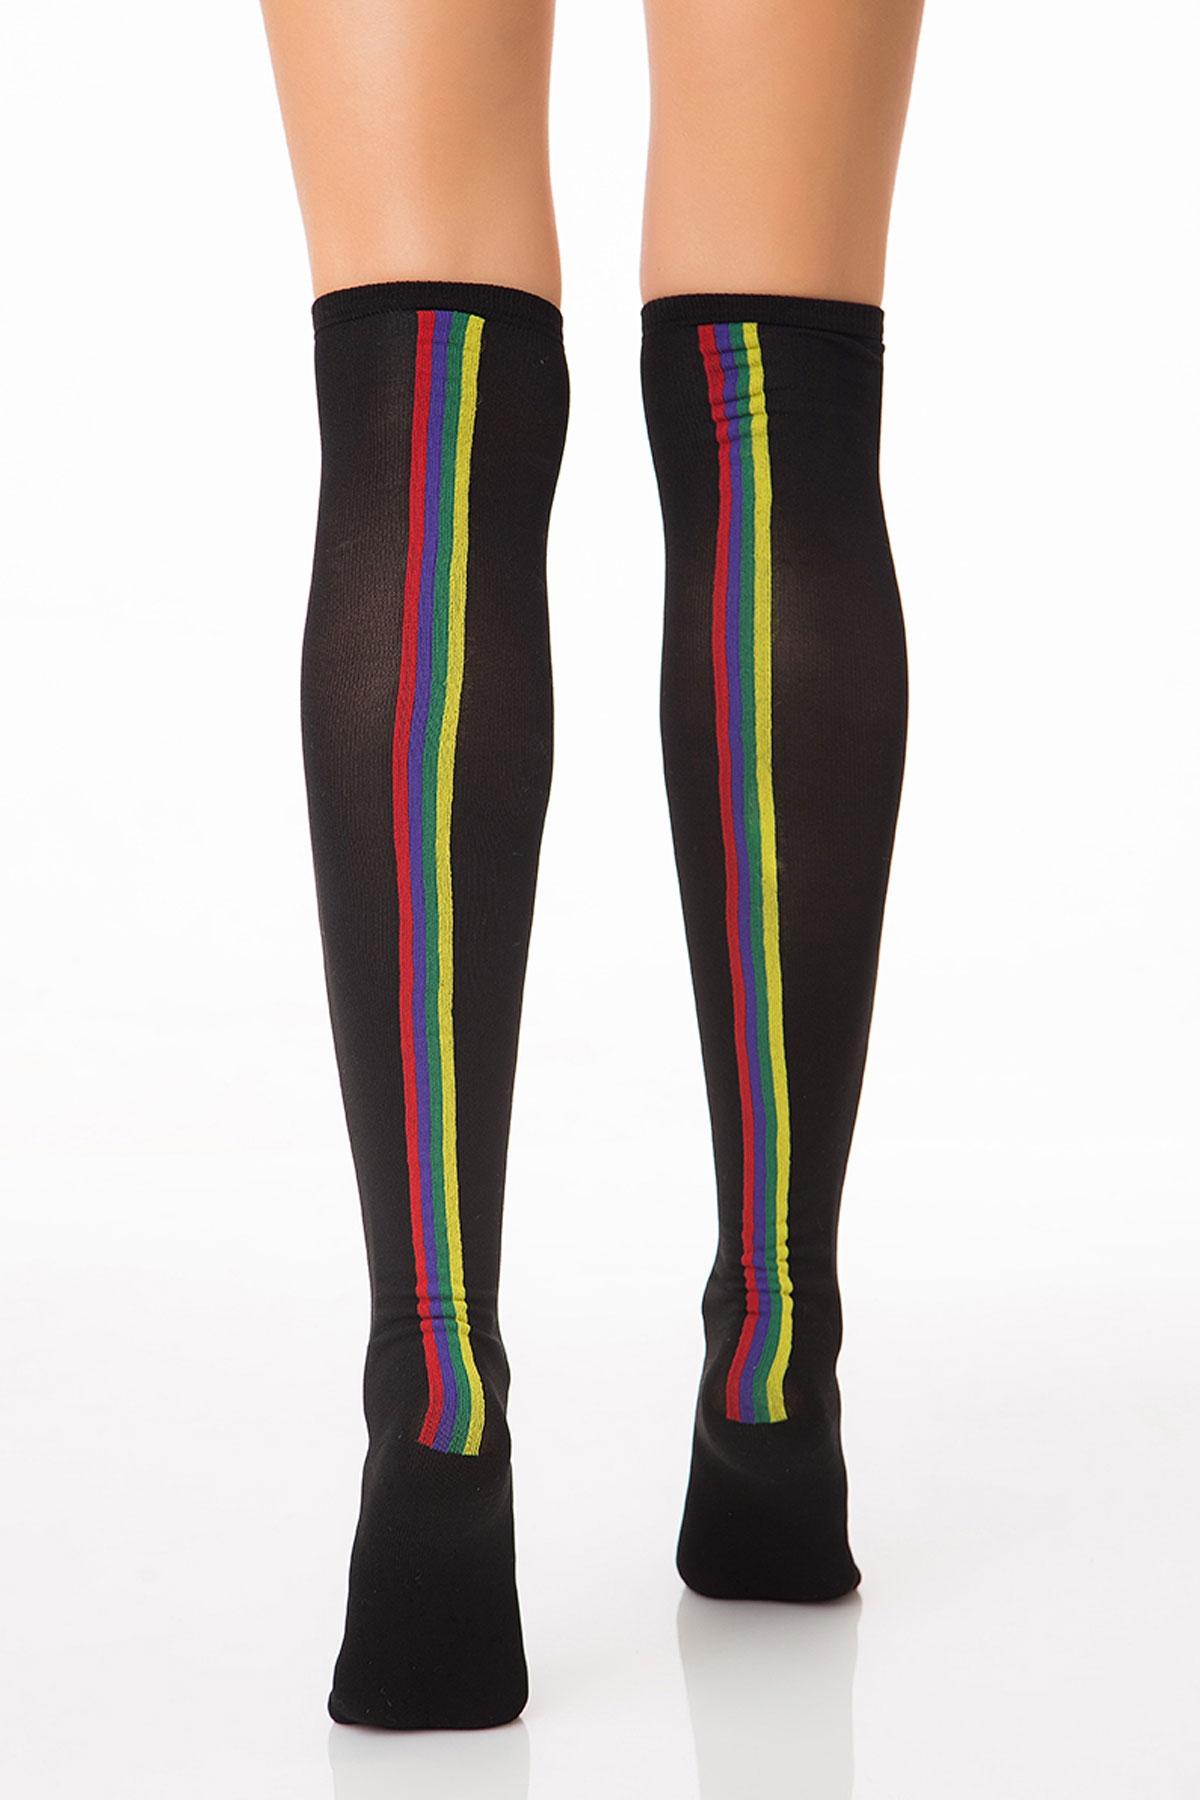 Дамски чорапи Four Lines / Krak me